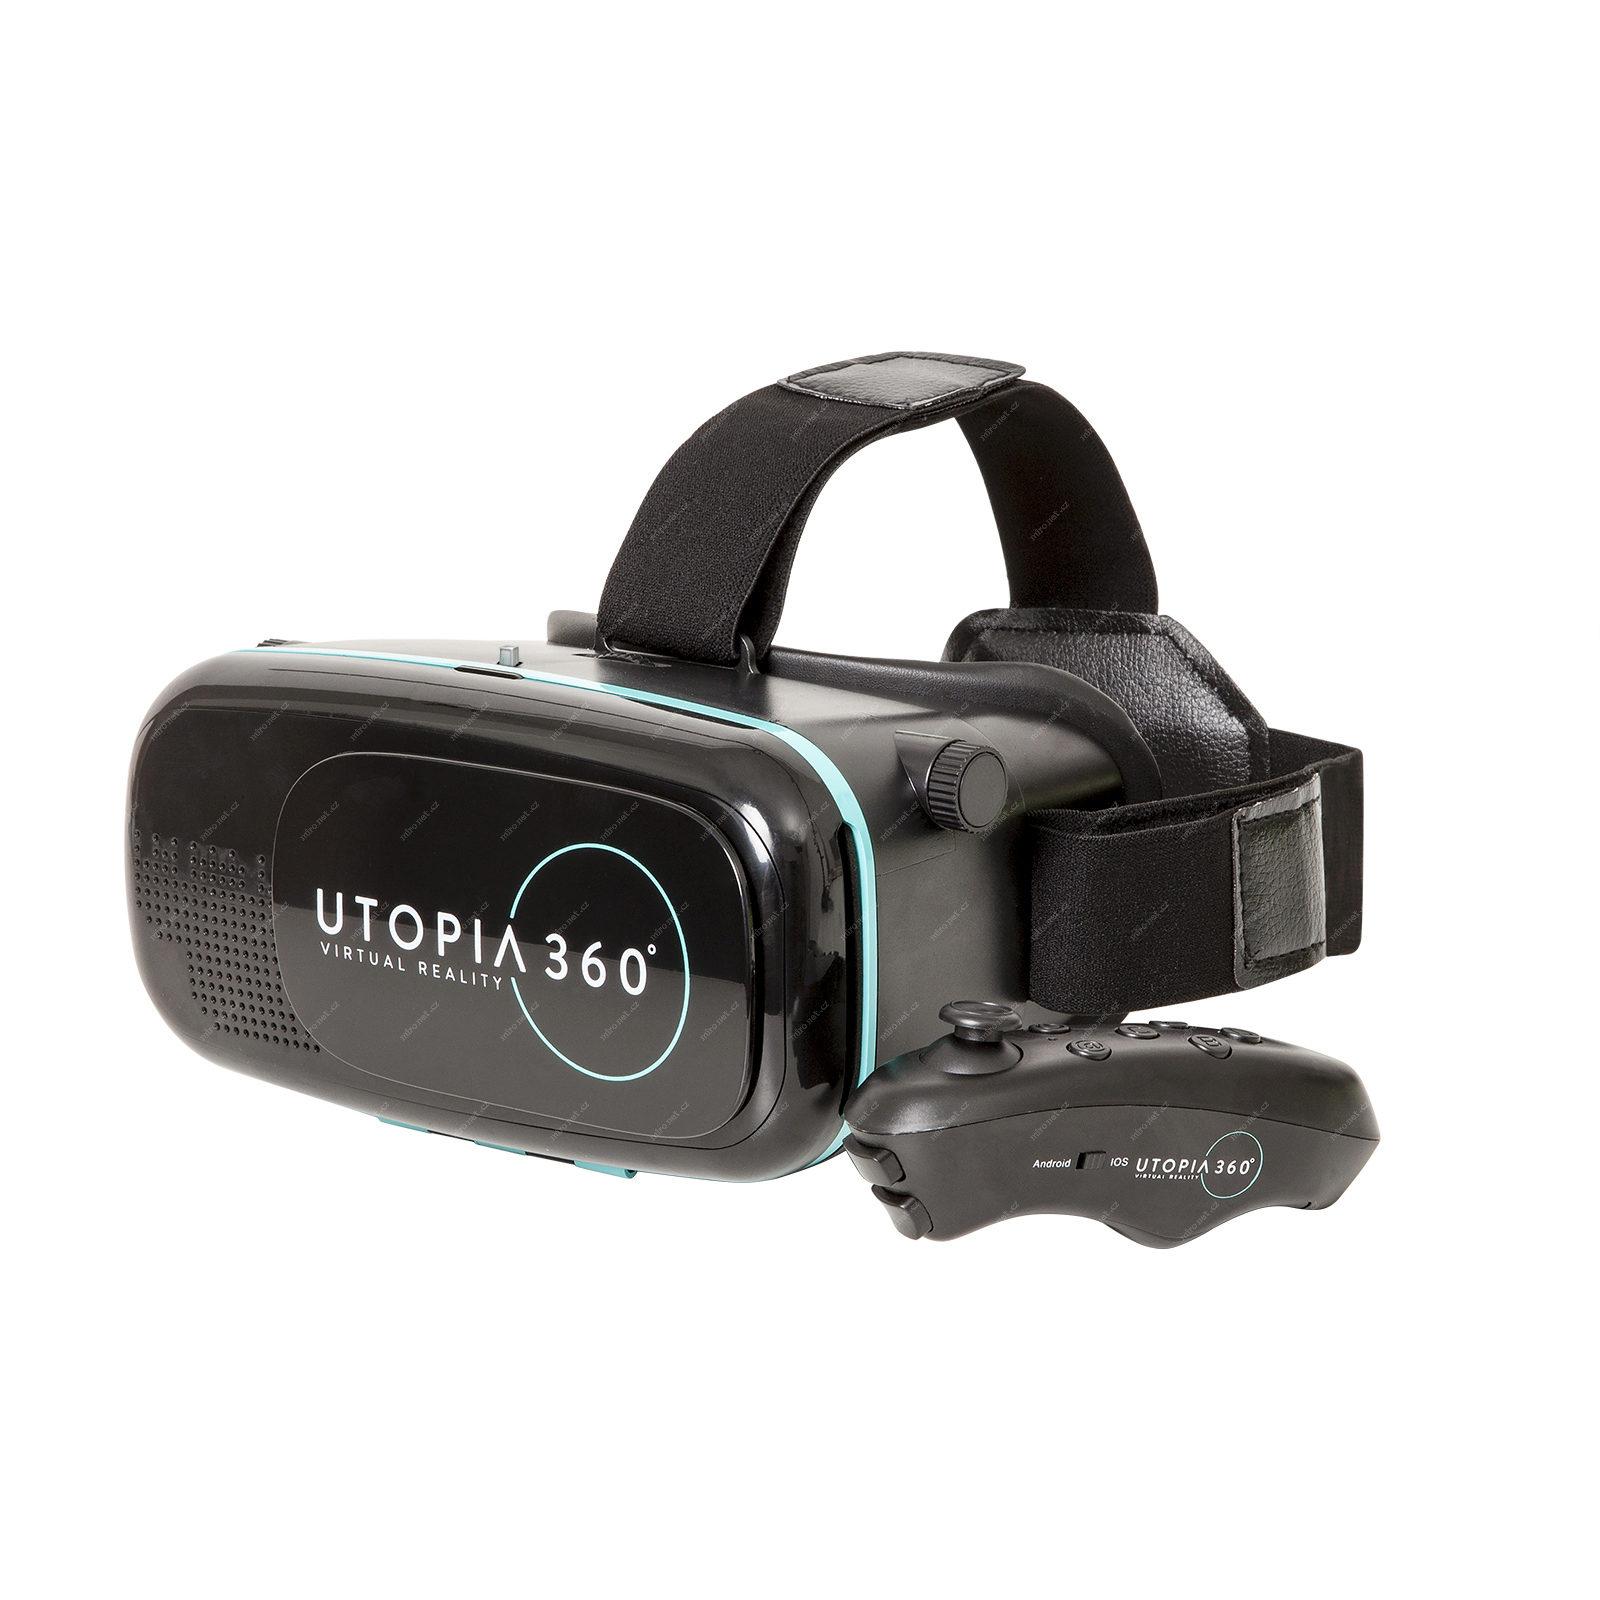 359cf6176 Pro virtuální realitu RETRAK VR Headset Utopia 360 / Brýle pro vi ...